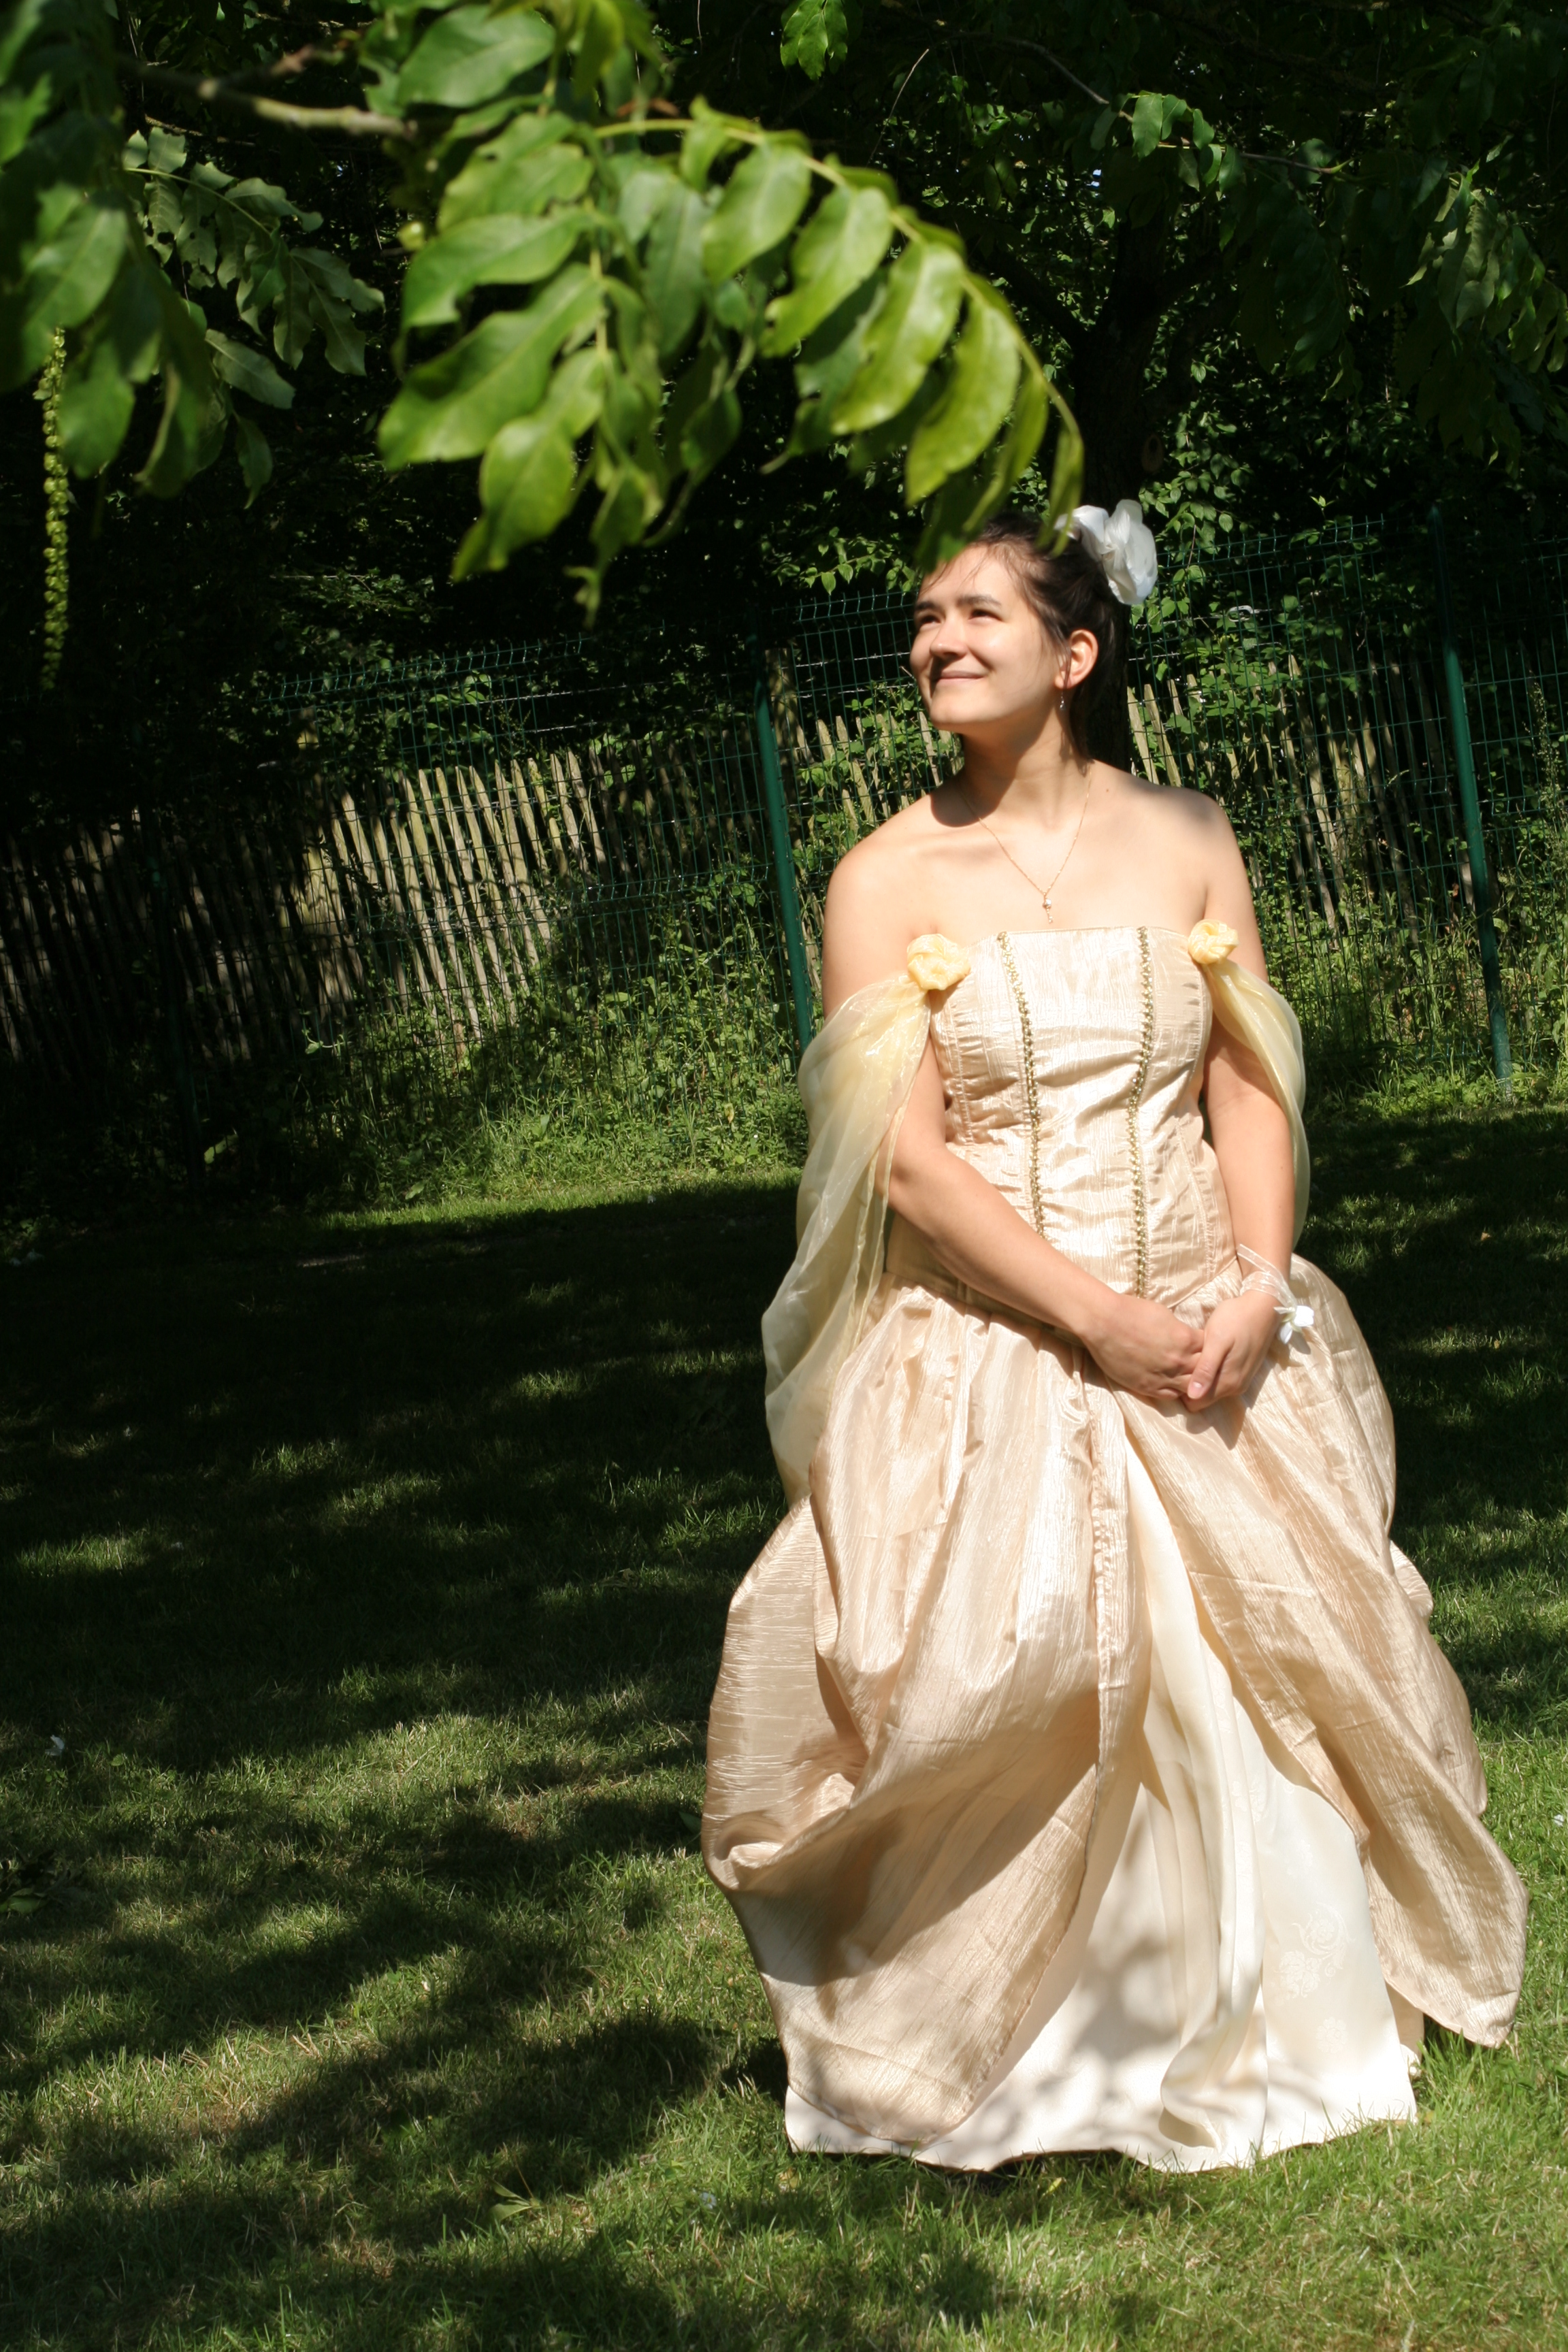 RachelArbre